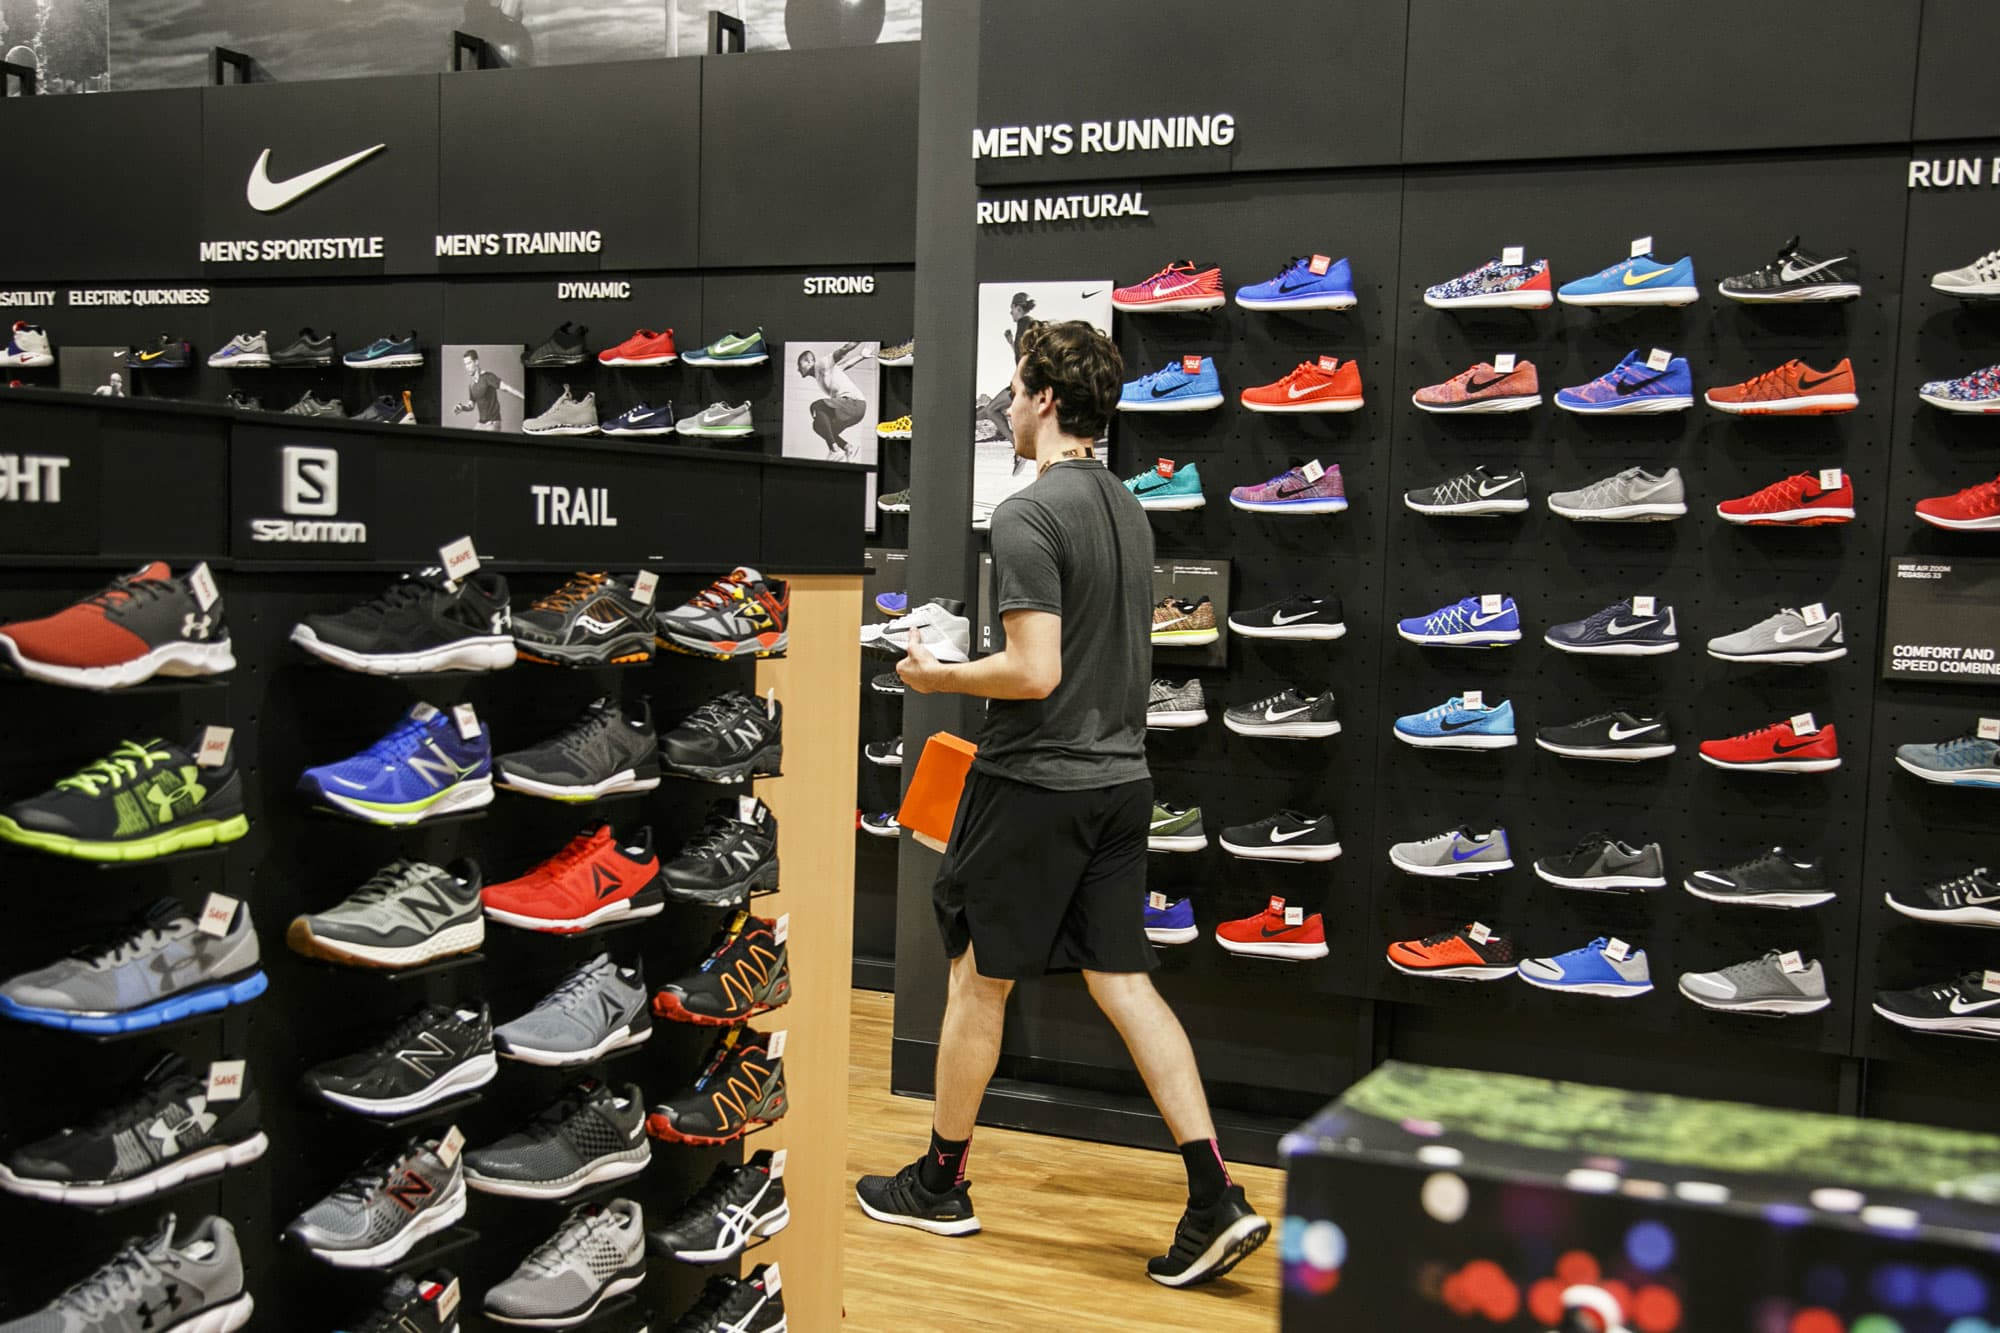 Details about Adidas Terrex Climacool Daroga BC0980 Sneaker Men's Mens Shoes Sneakers show original title